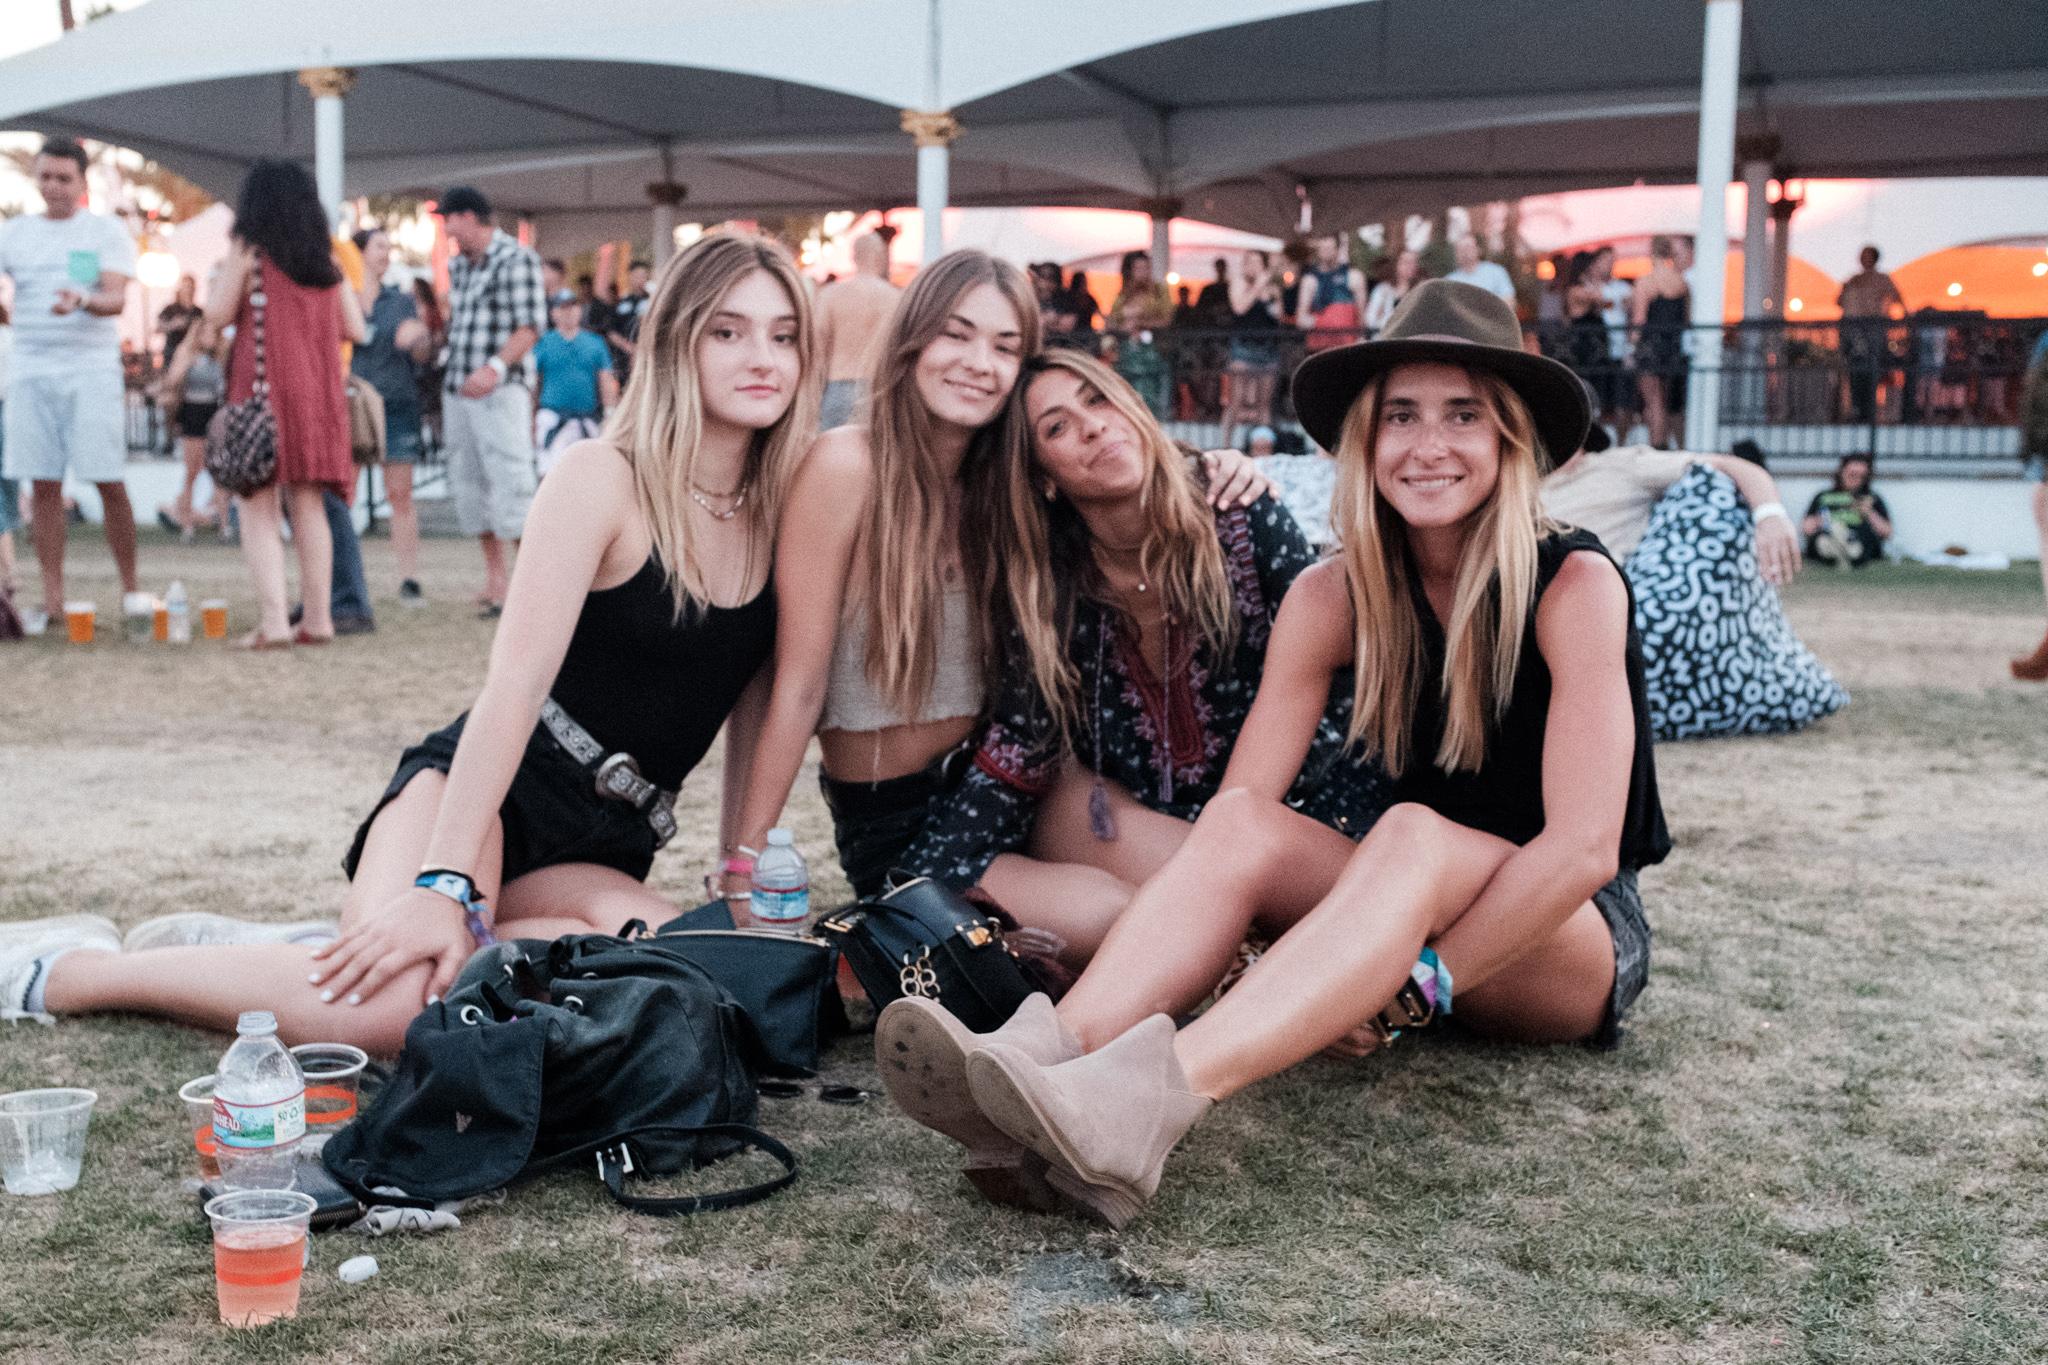 170423 Coachella 17 w2 2104.jpg